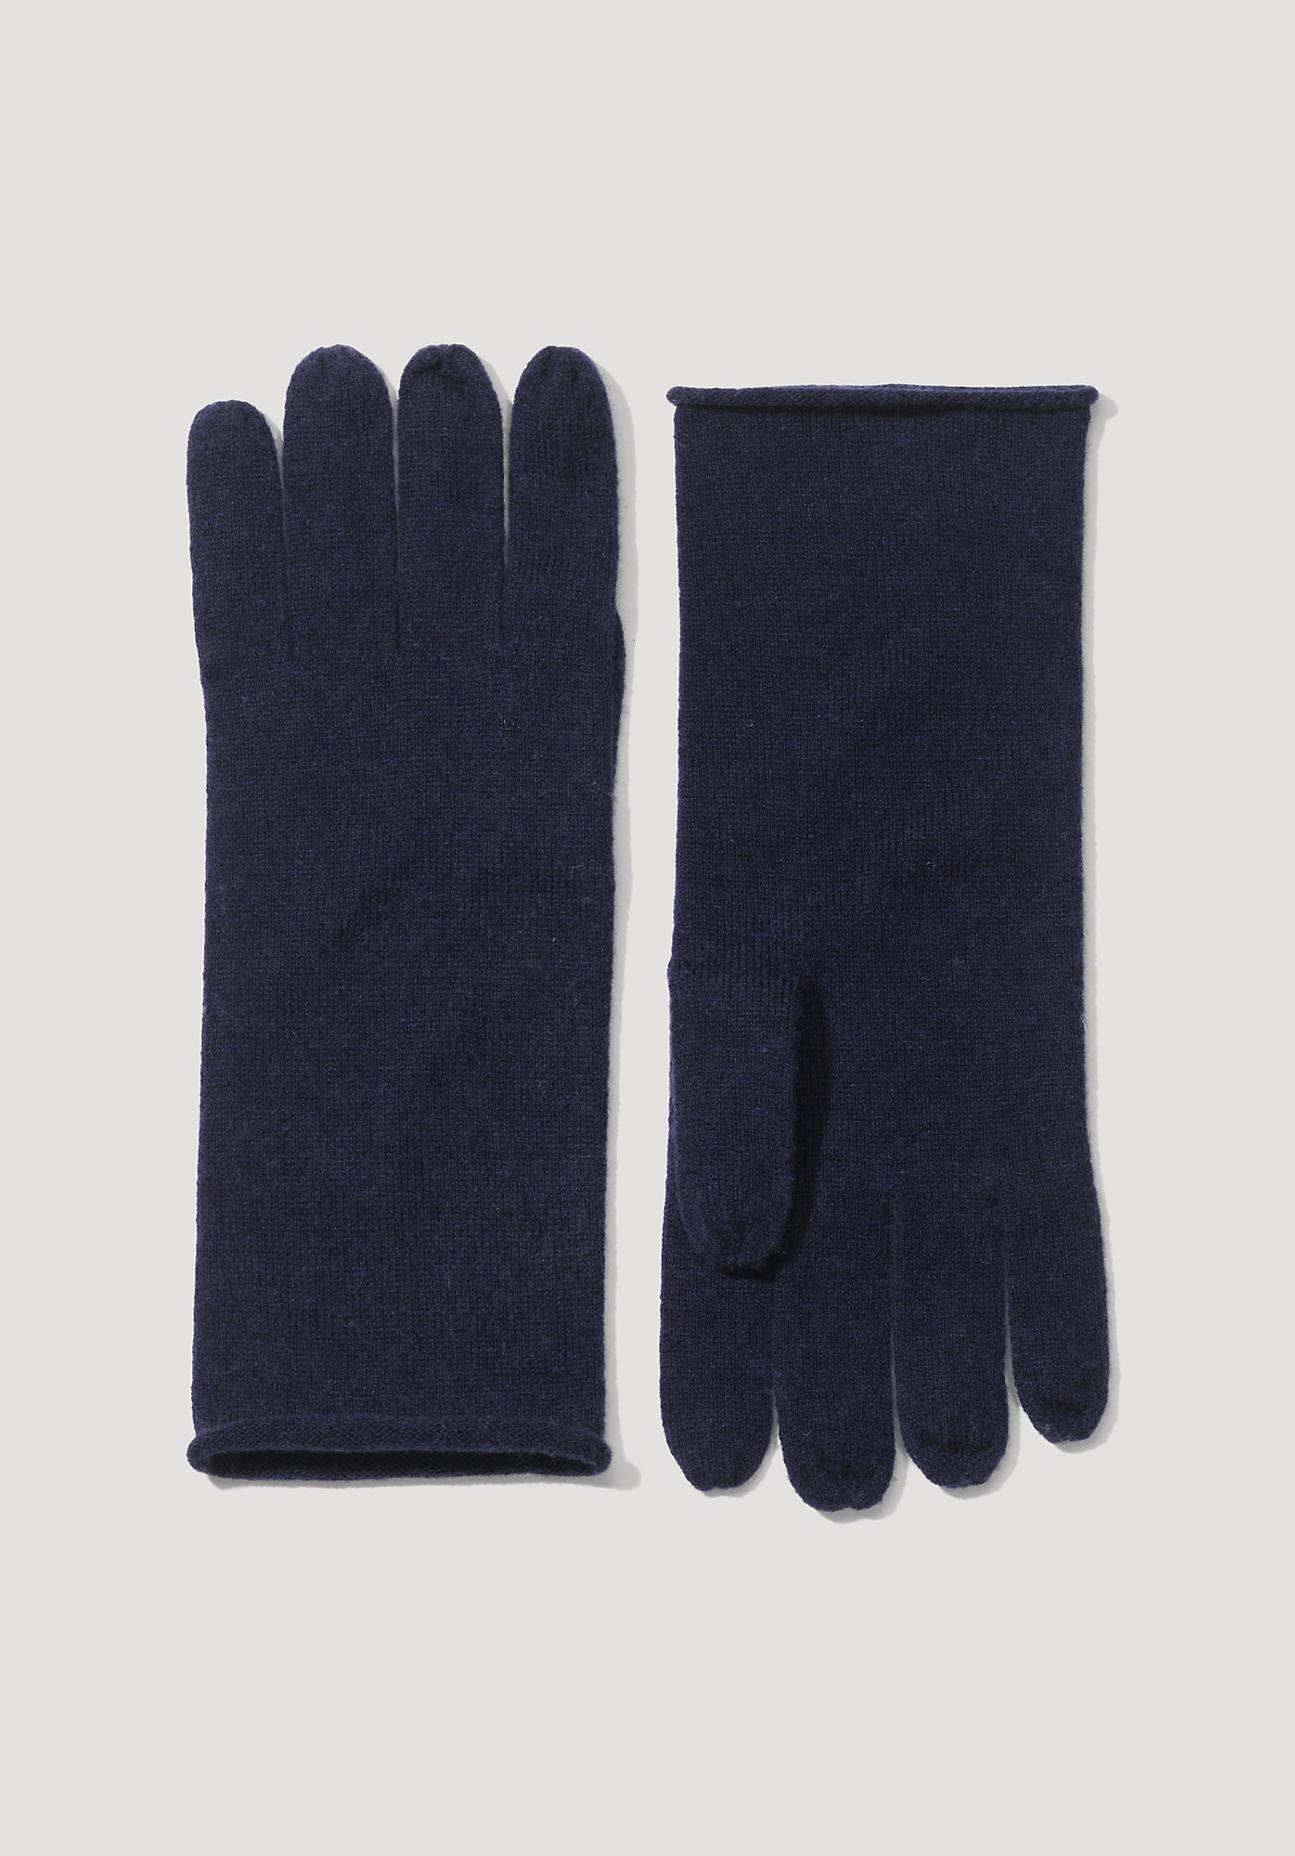 Handschuhe für Frauen - hessnatur Damen Damen Handschuhe aus Schurwolle mit Kaschmir – blau –  - Onlineshop Hessnatur